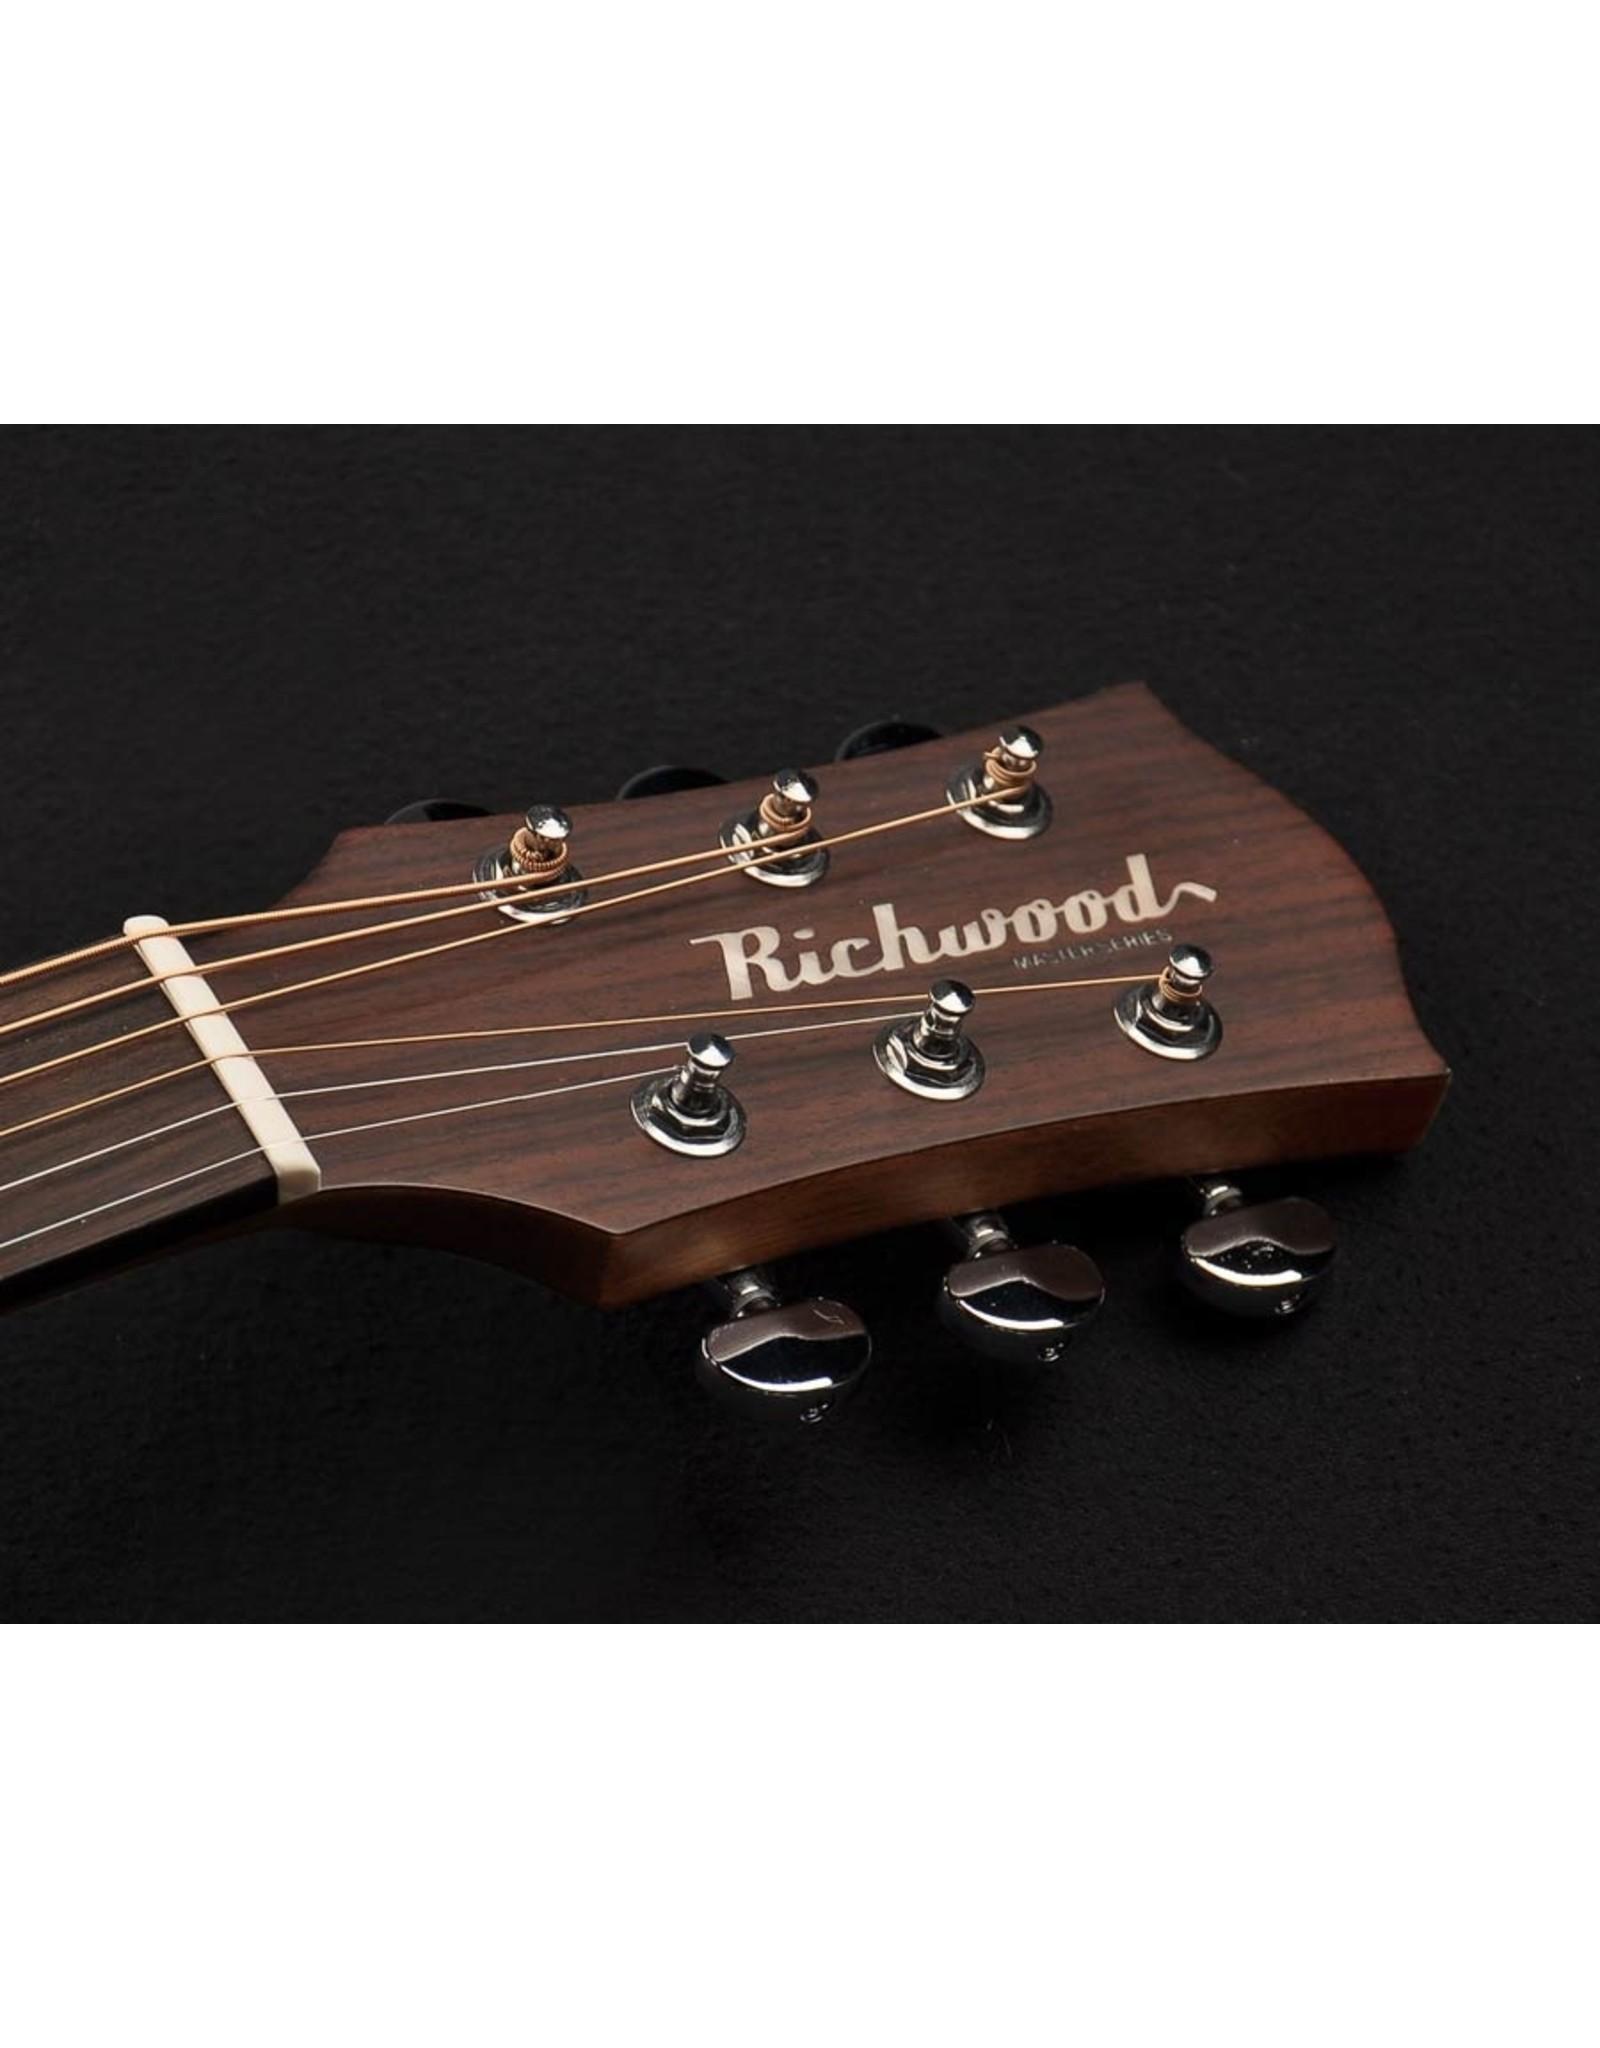 Richwood Richwood G-65-CEVA